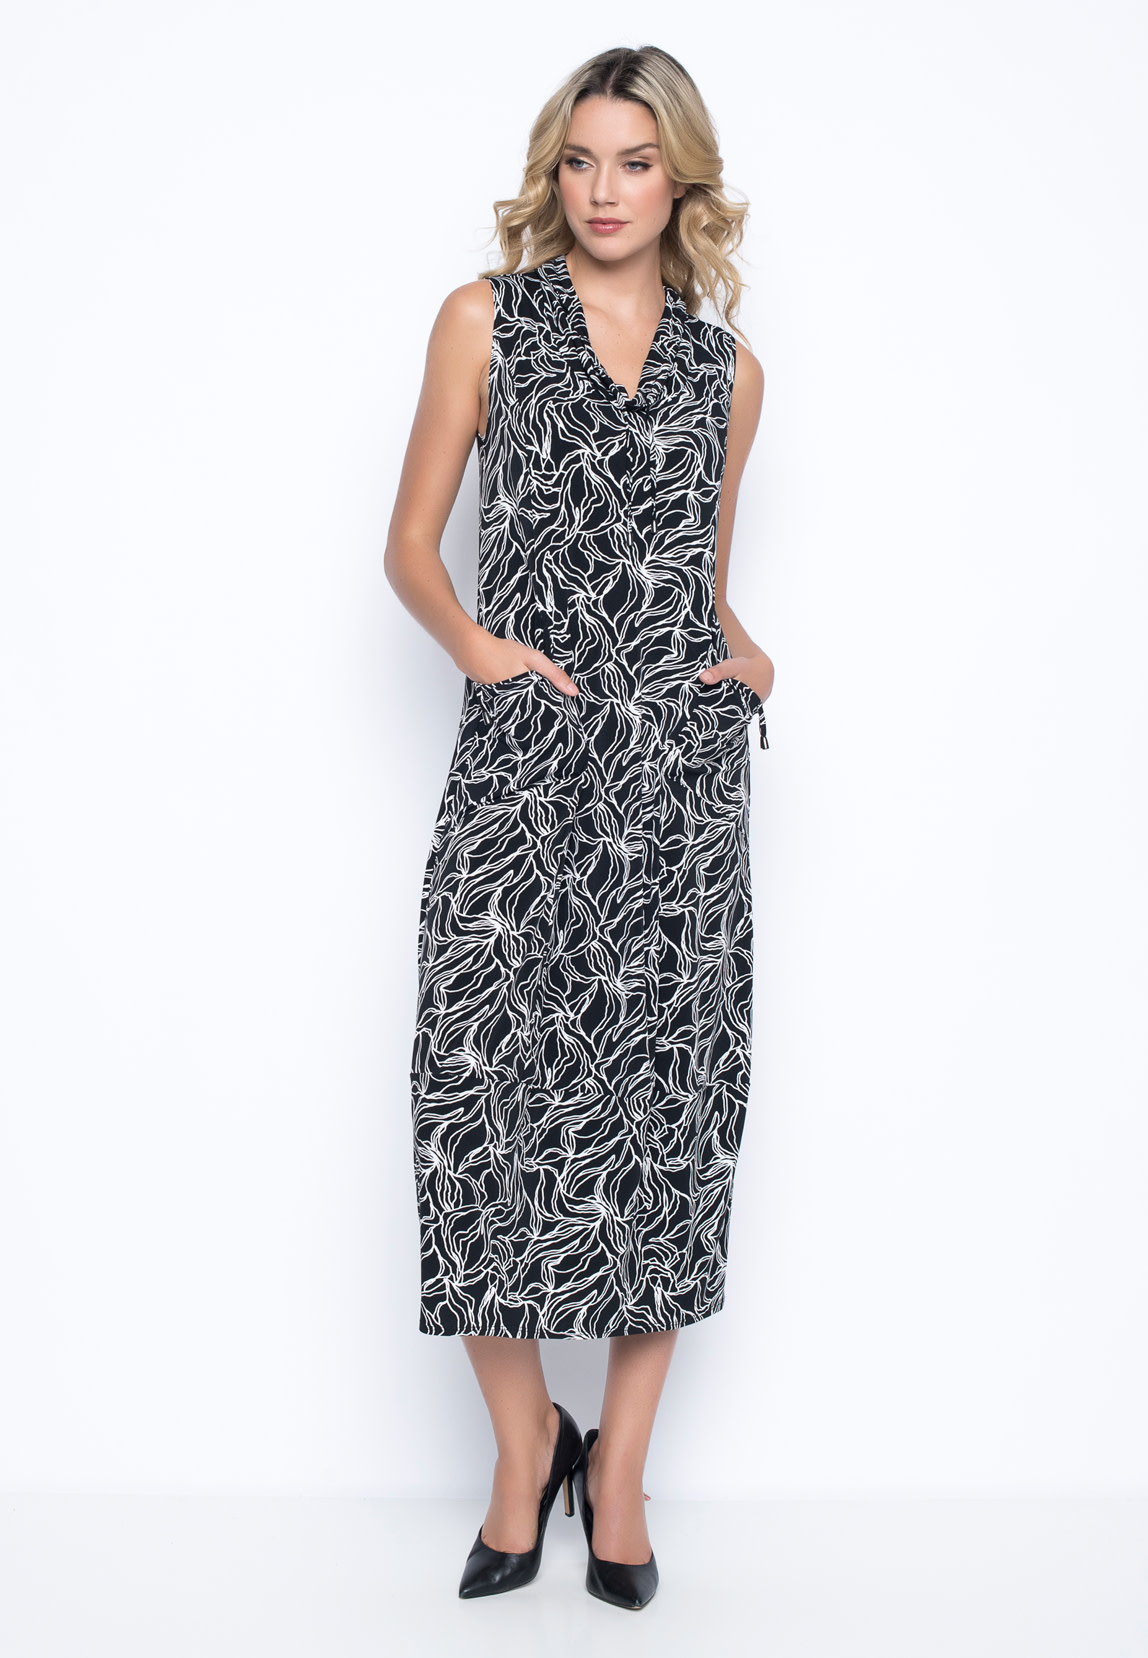 Sleeveless Dress with Drawstring Collar